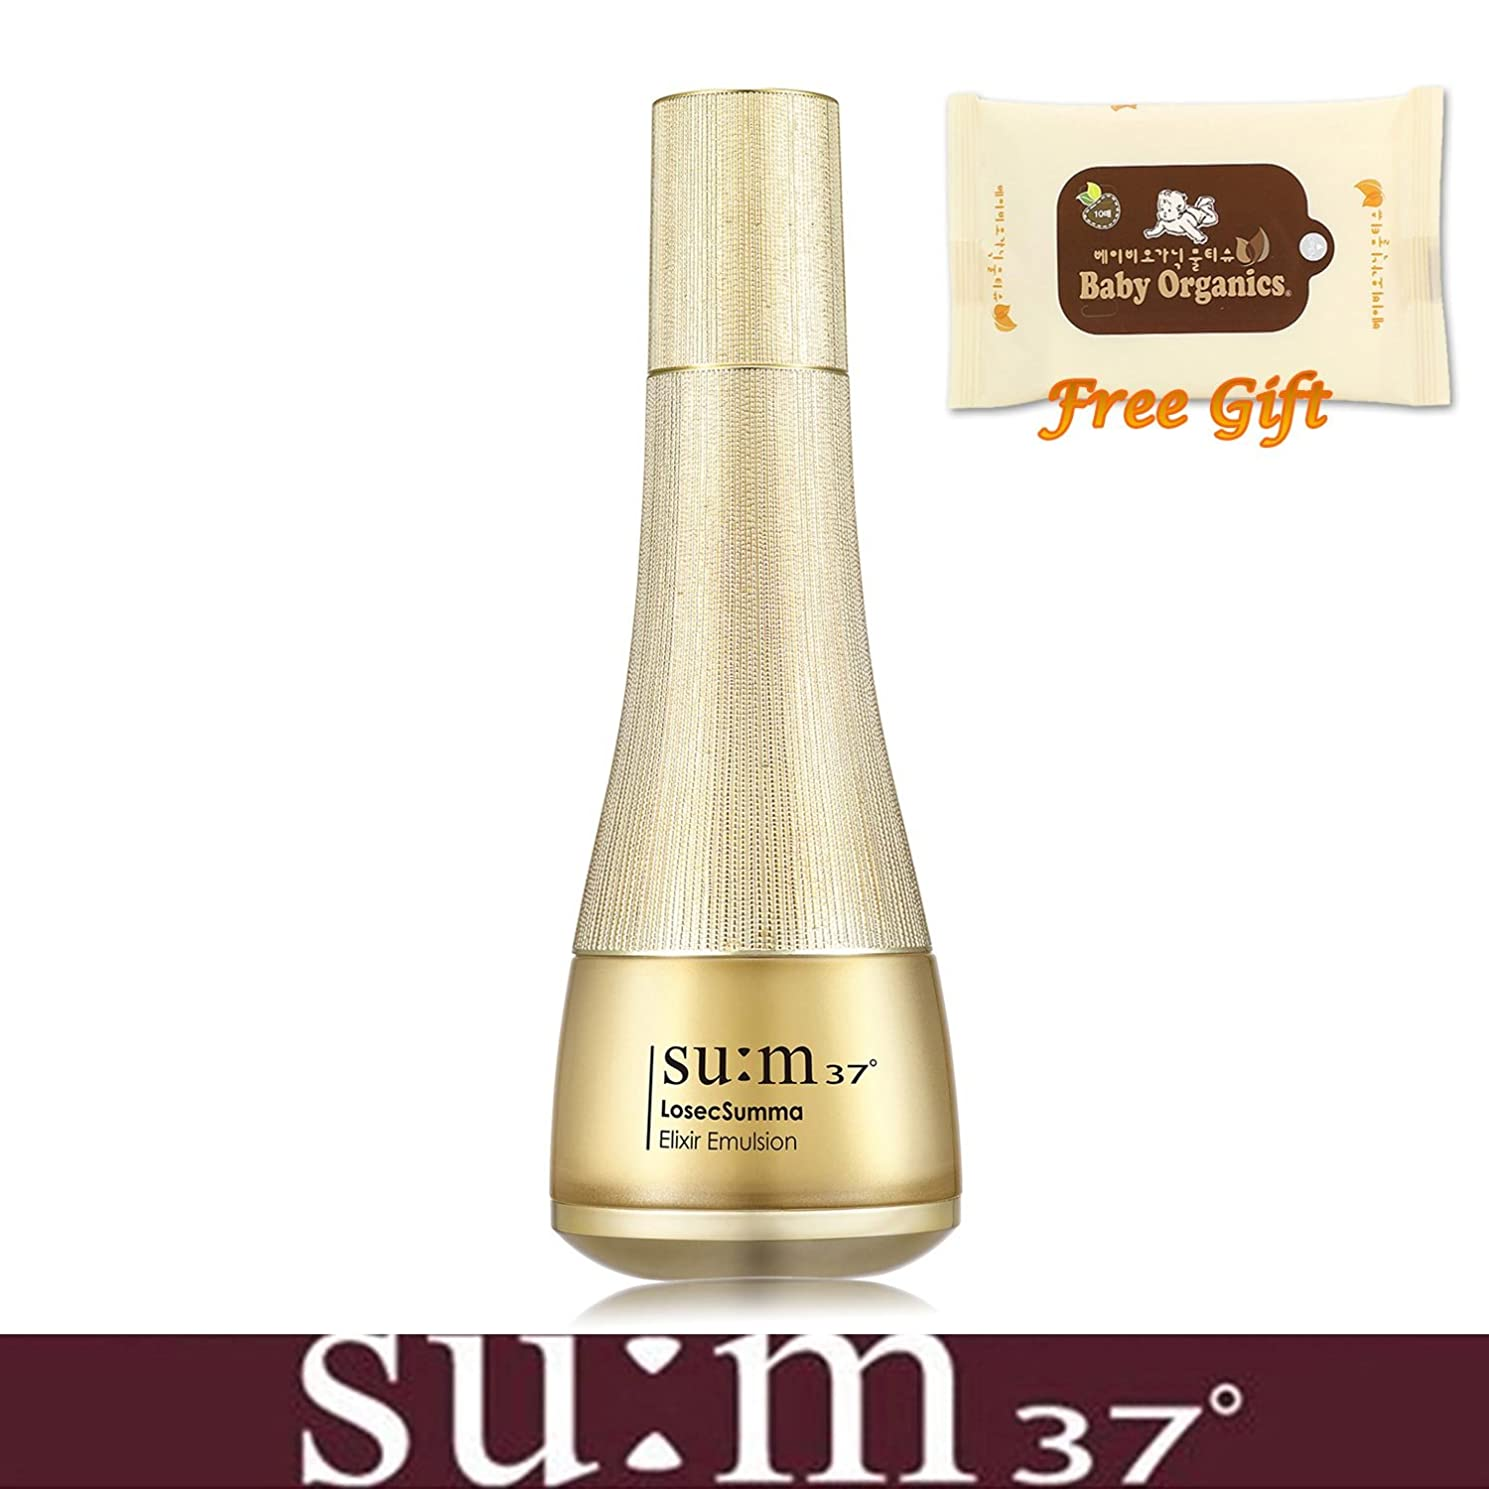 [su:m37/スム37°]Sum37 LOSEC SUMMA ELIXIR emulsion 130 ml+ Portable Tissue/スム37 LOSEC SUMMA ELIXIR エマルジョン 130ml + [Free Gift](海外直送品)